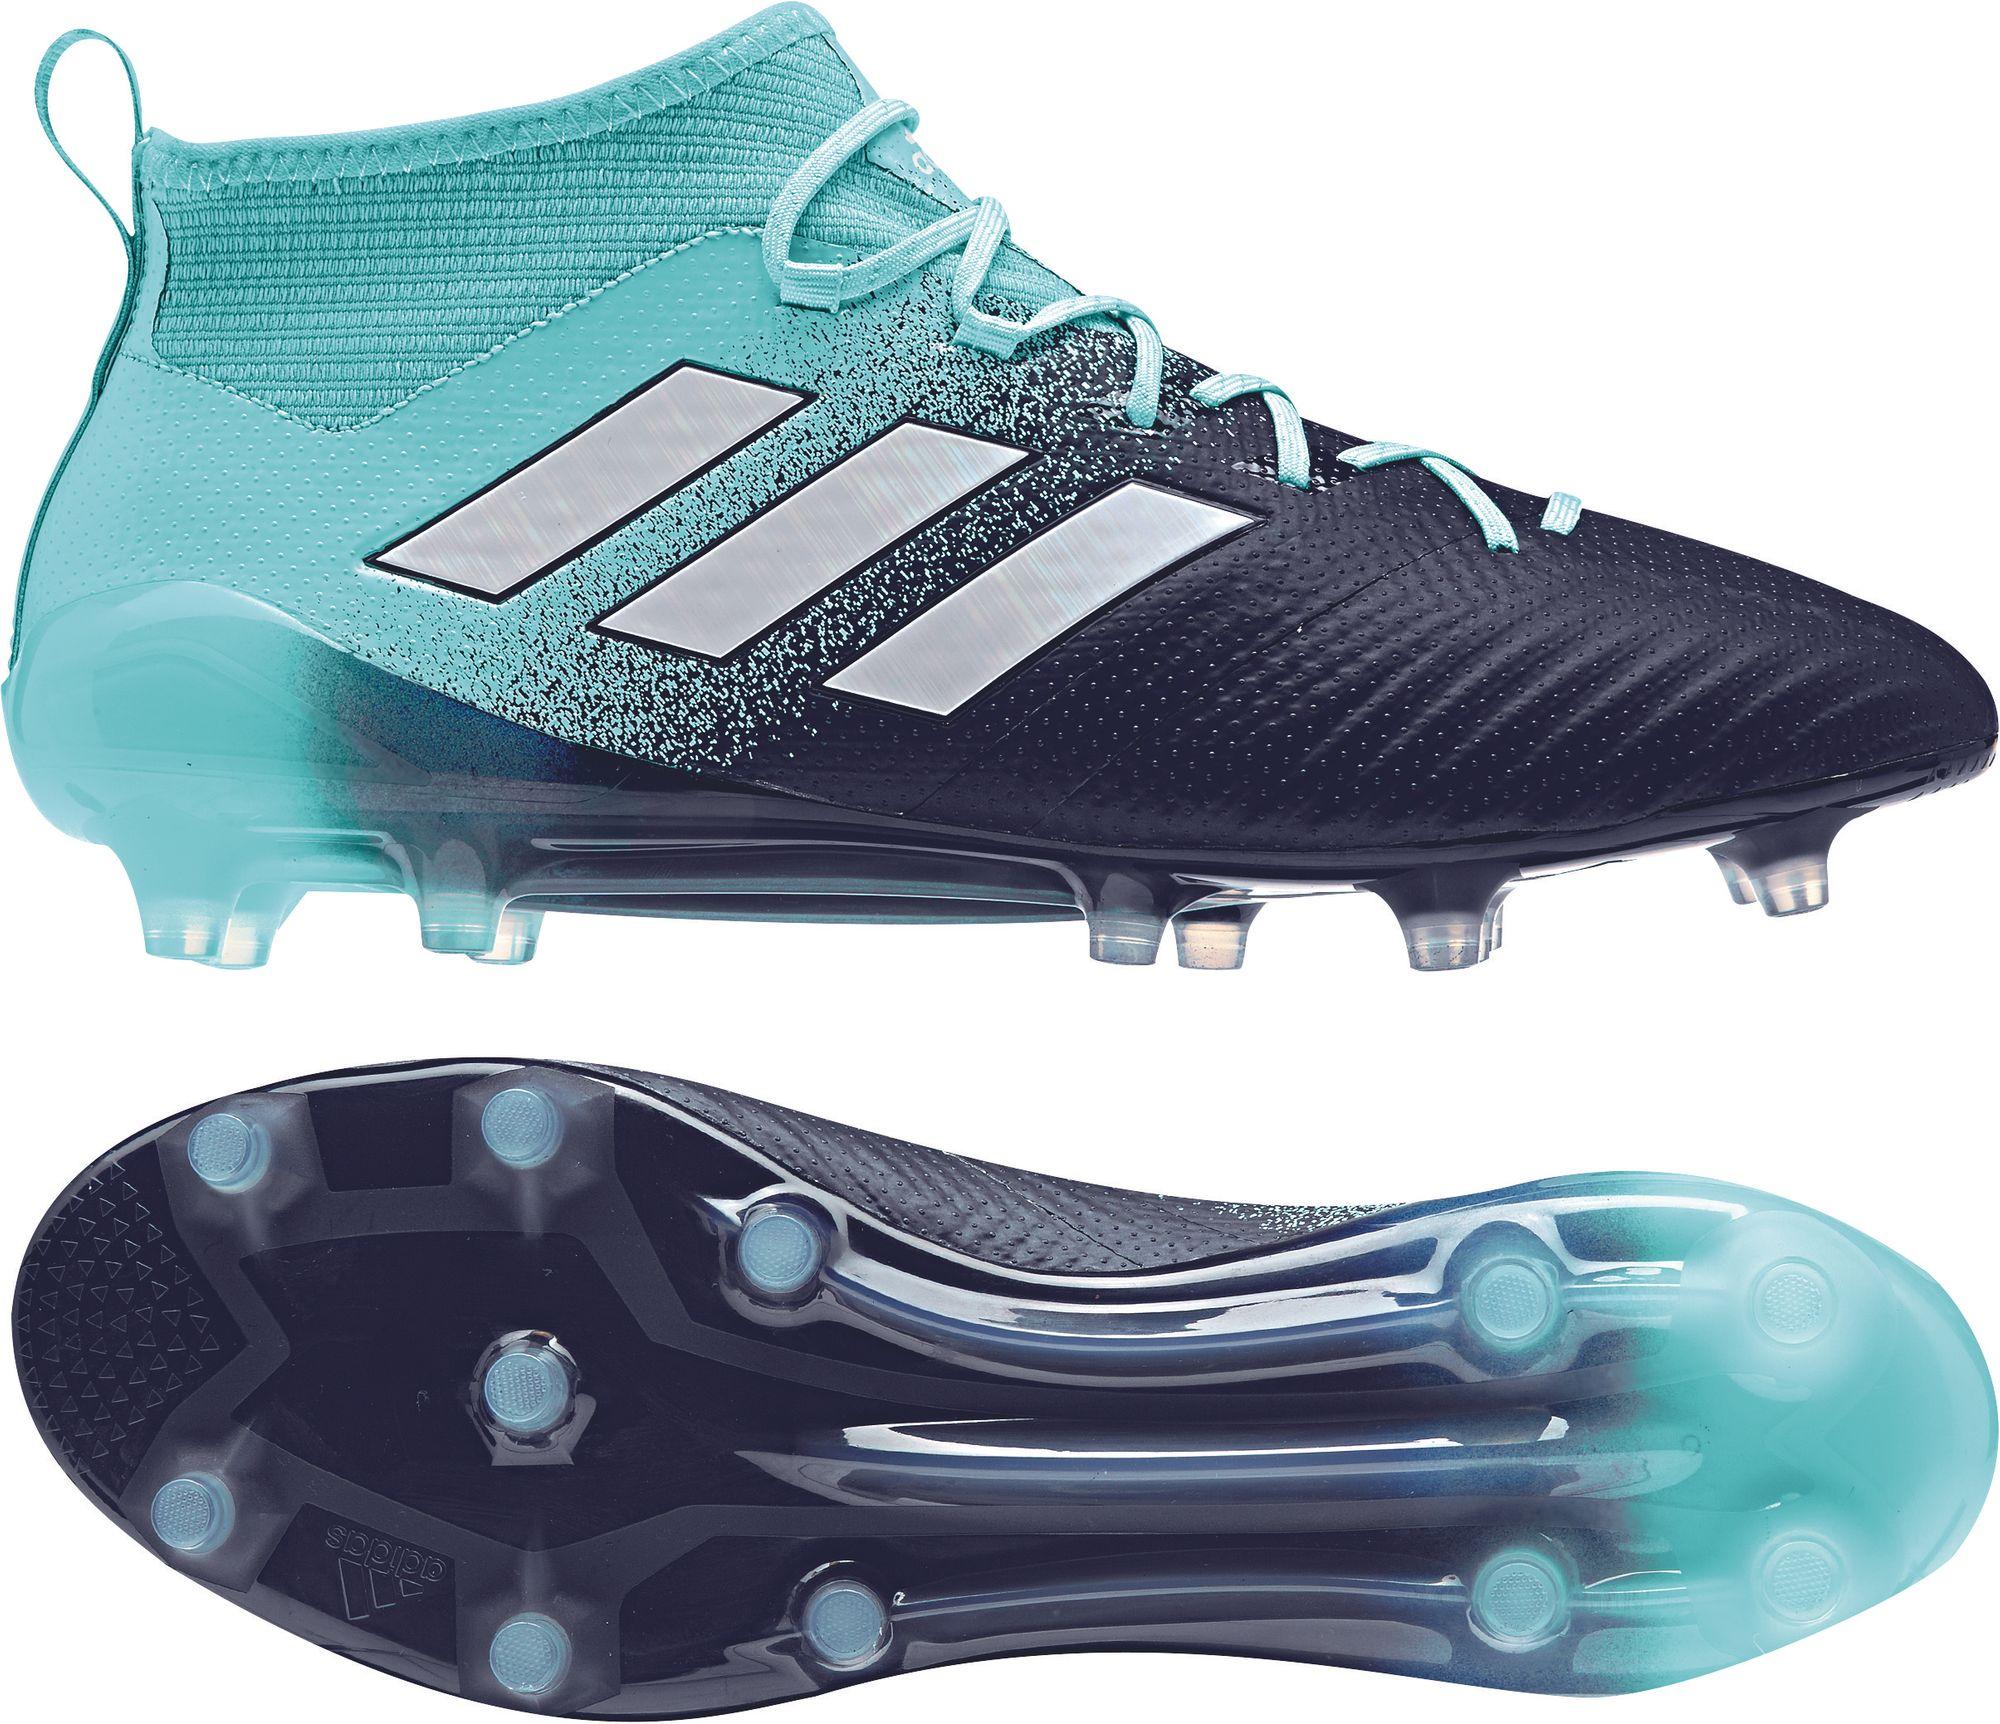 reputable site 72ee7 0c4e2 adidas ACE 17.1 FG türkis-blau